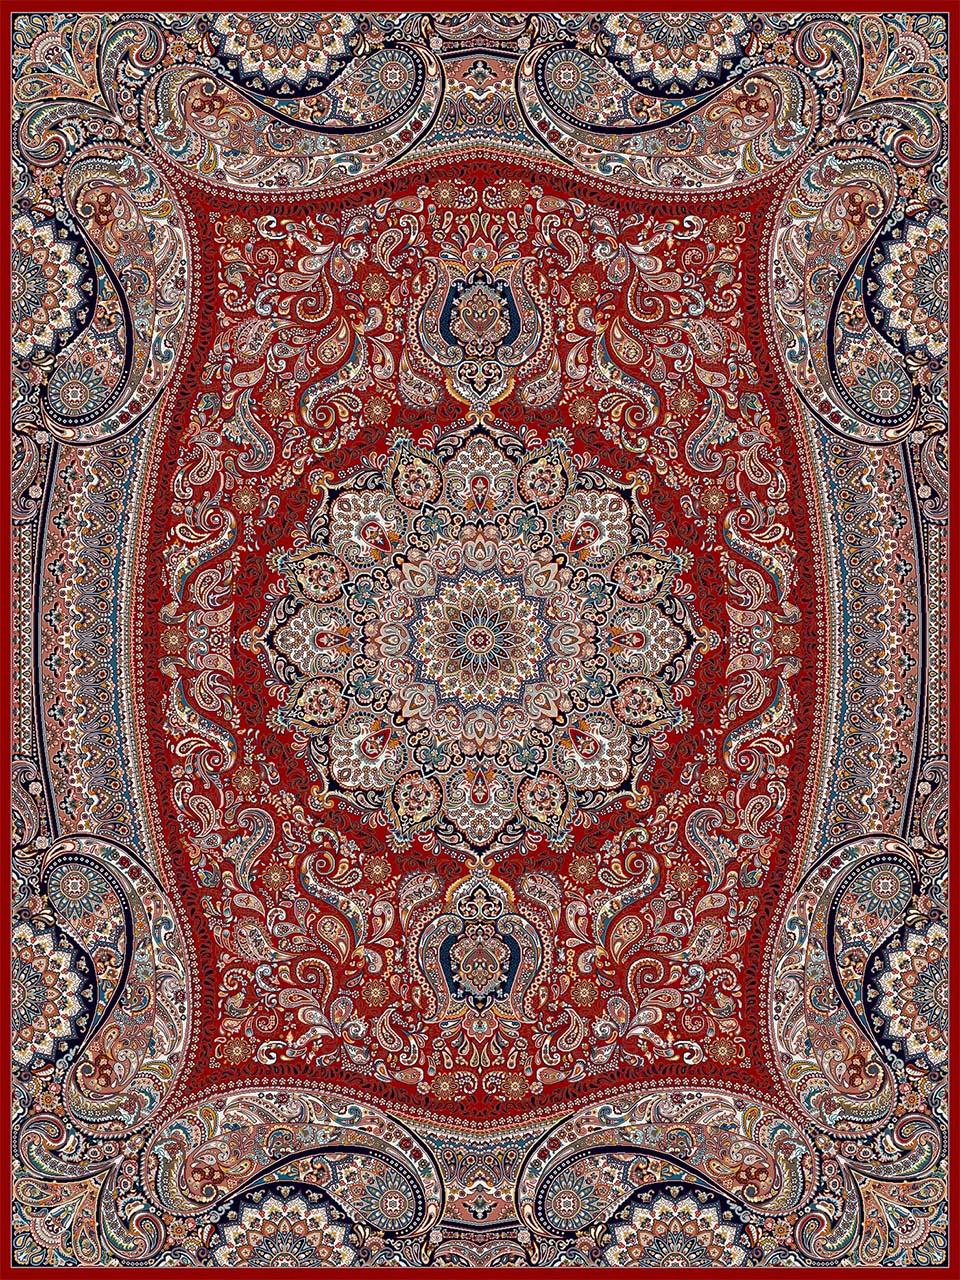 فرش (18122) اکریلیک - 8 رنگ - 500 شانه - لاكي - تراکم 1000